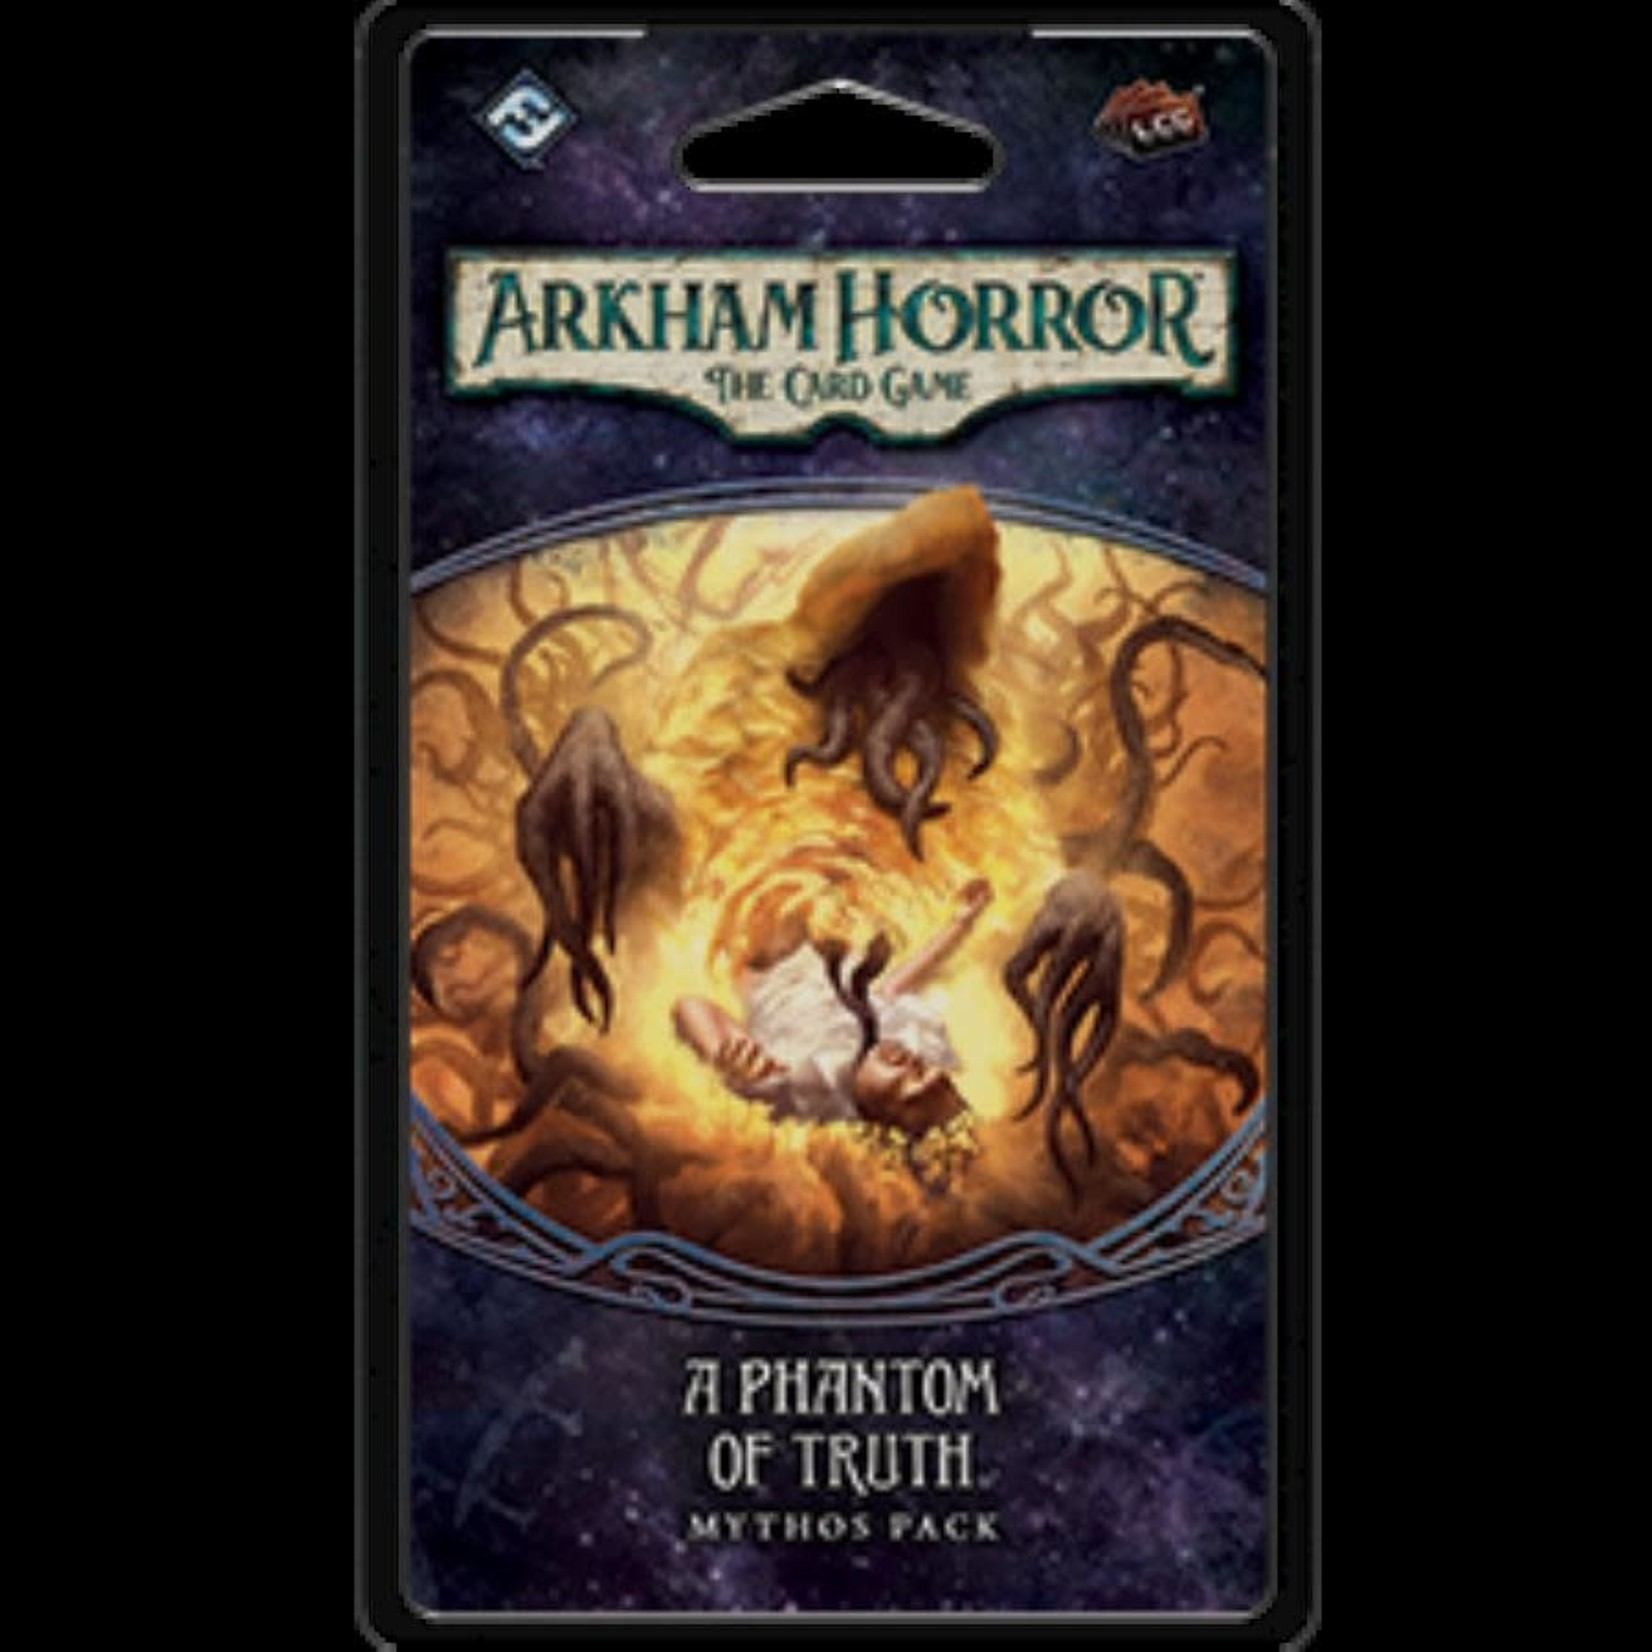 Fantasy Flight Games Arkham Horror LCG: A Phantom of Truth Mythos Pack (Path to Carcosa 3)